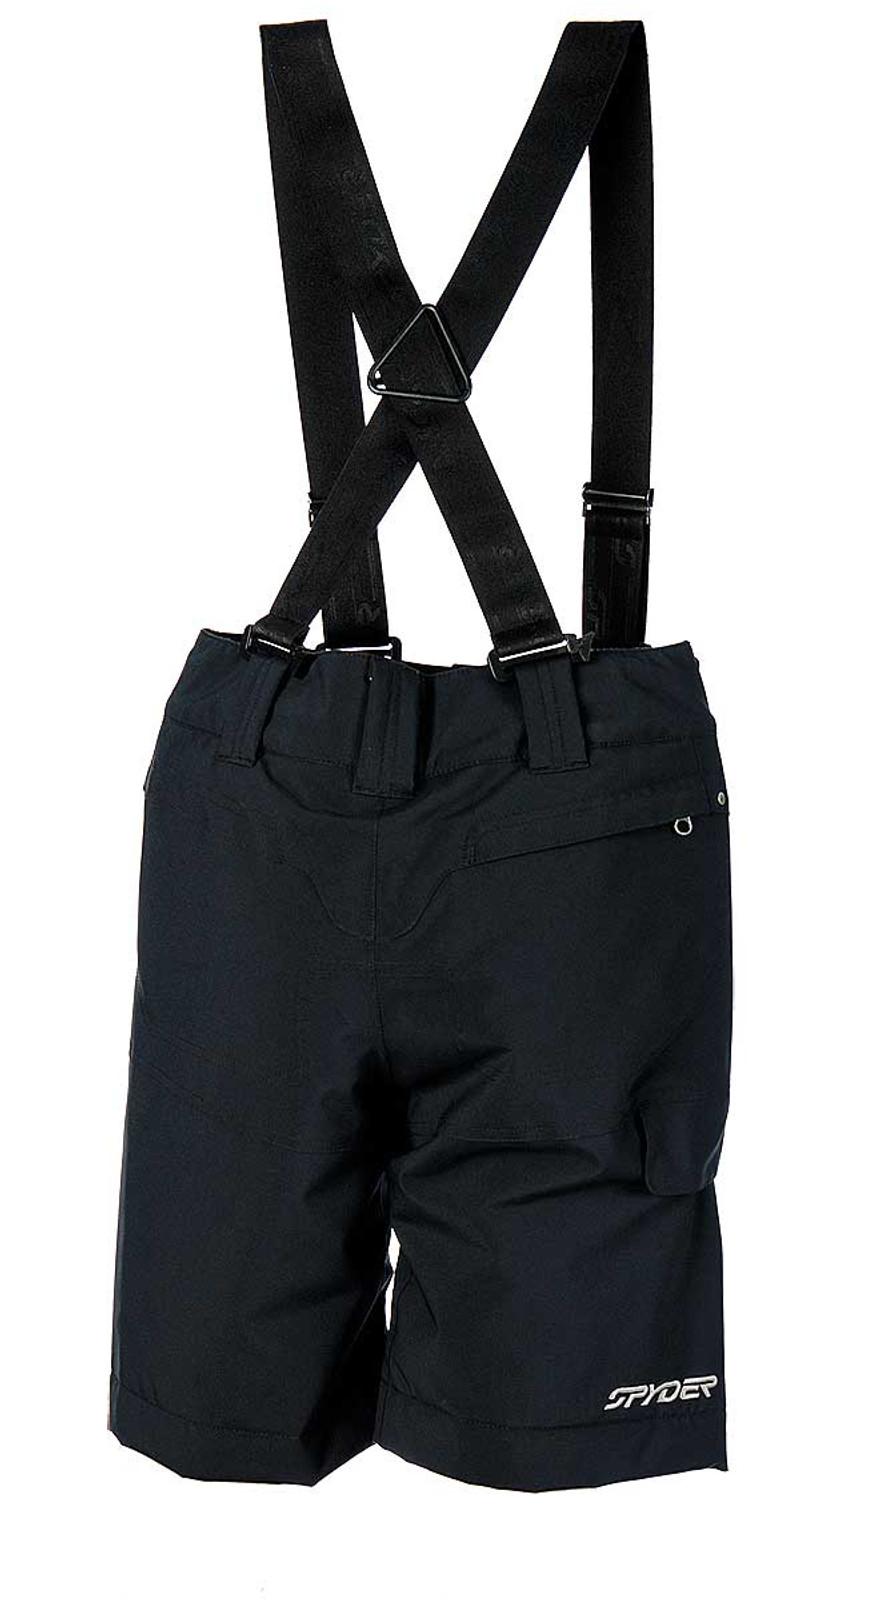 Spyder Kid's Training Pants - Back View